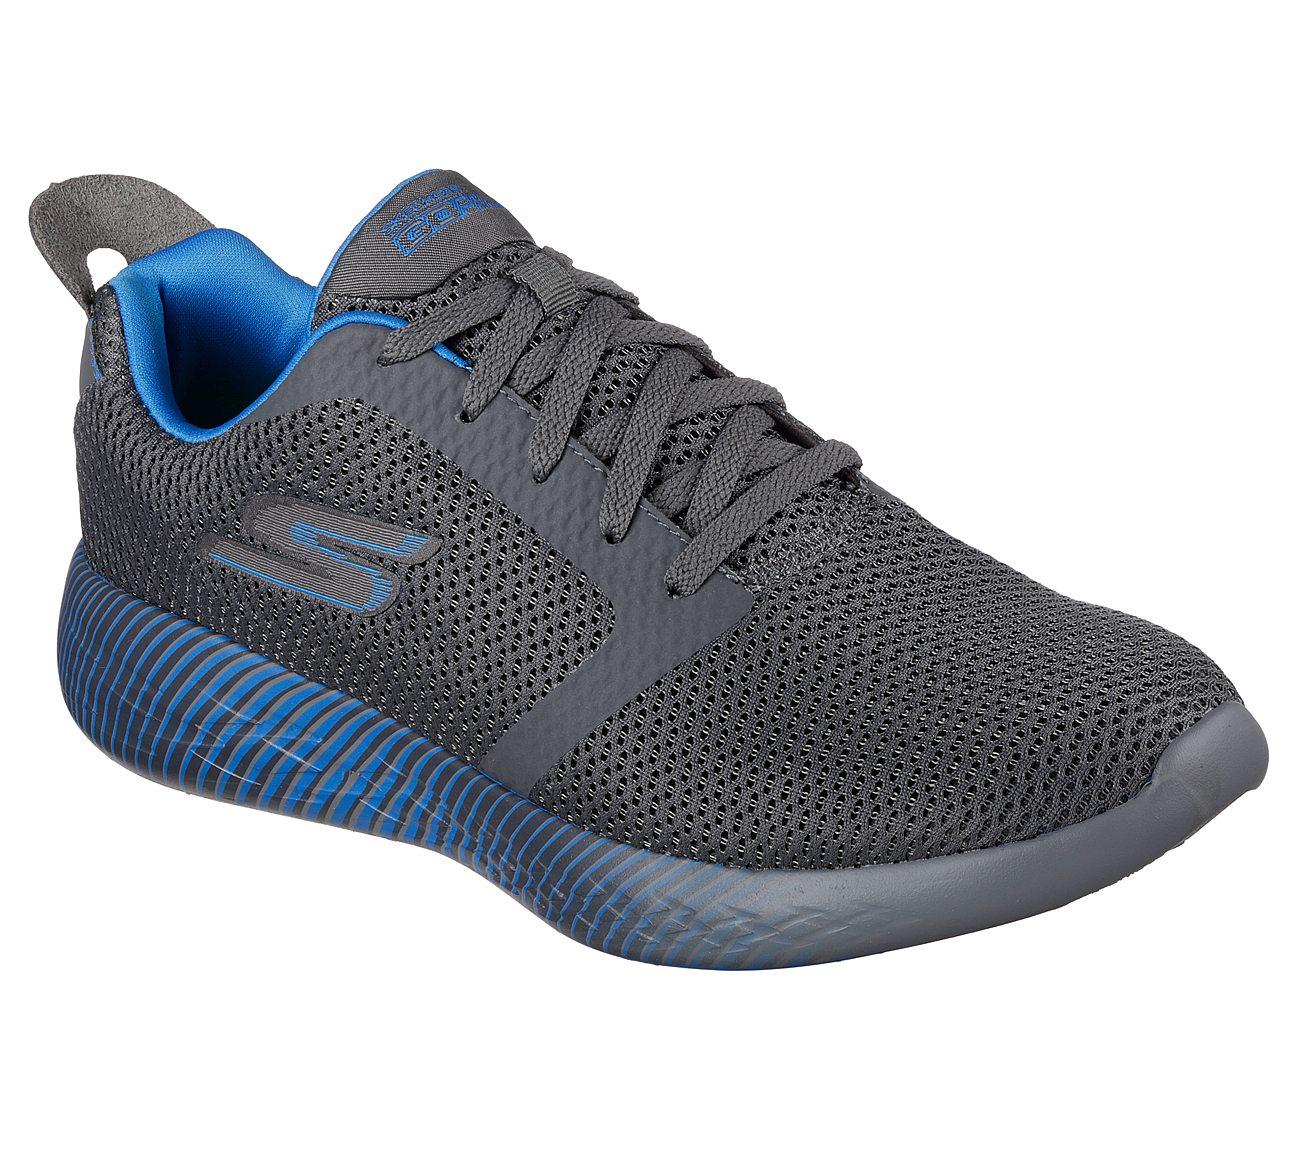 guerra esqueleto Ajuste  Buy SKECHERS Skechers GOrun 600 - Spectra Skechers Performance Shoes